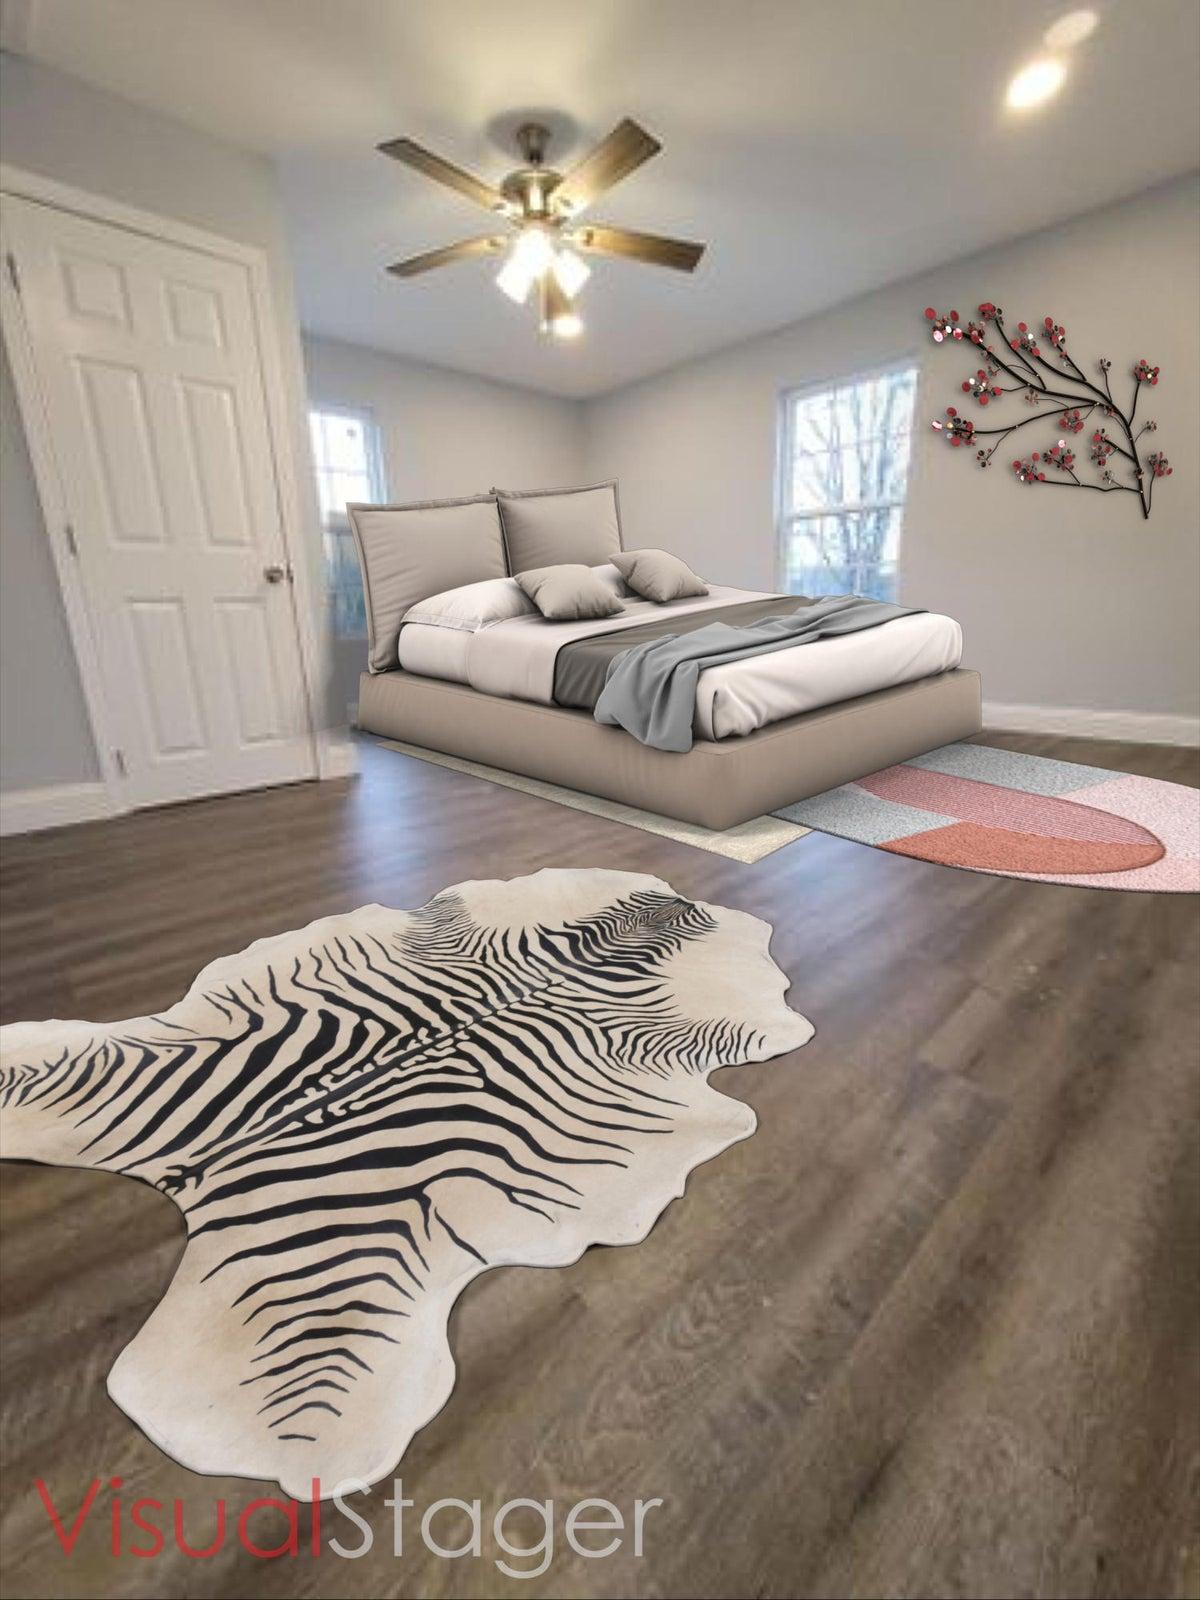 Virtual staged master bedroom